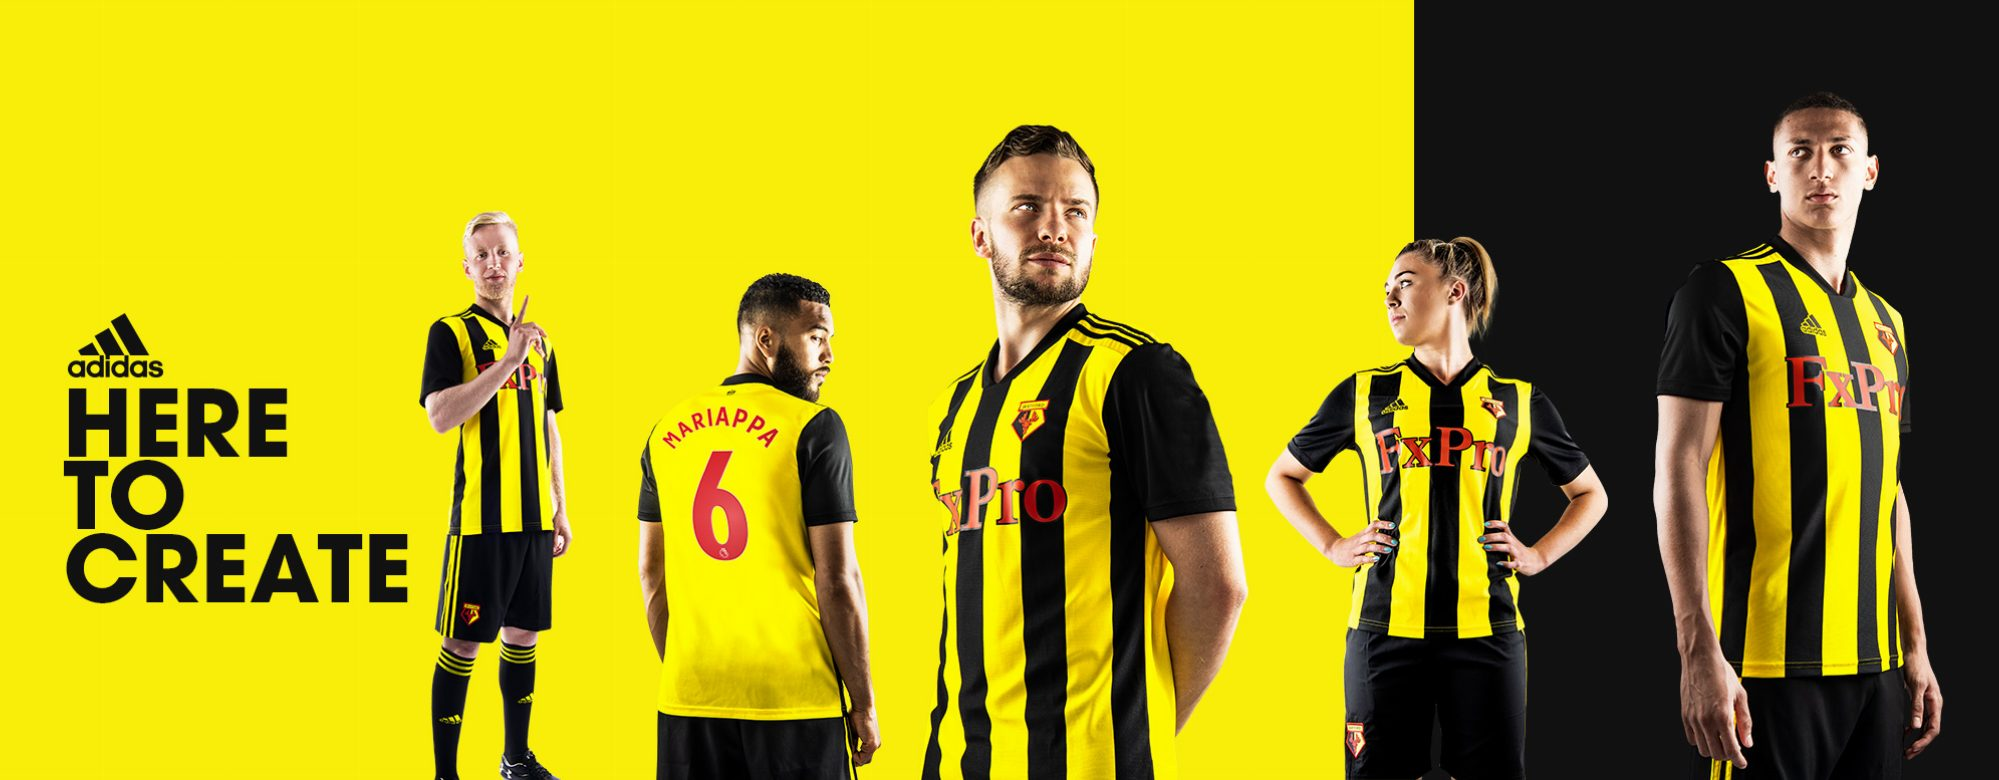 185d83109 Watford FC 2018 19 adidas Home Kit – FOOTBALL FASHION.ORG